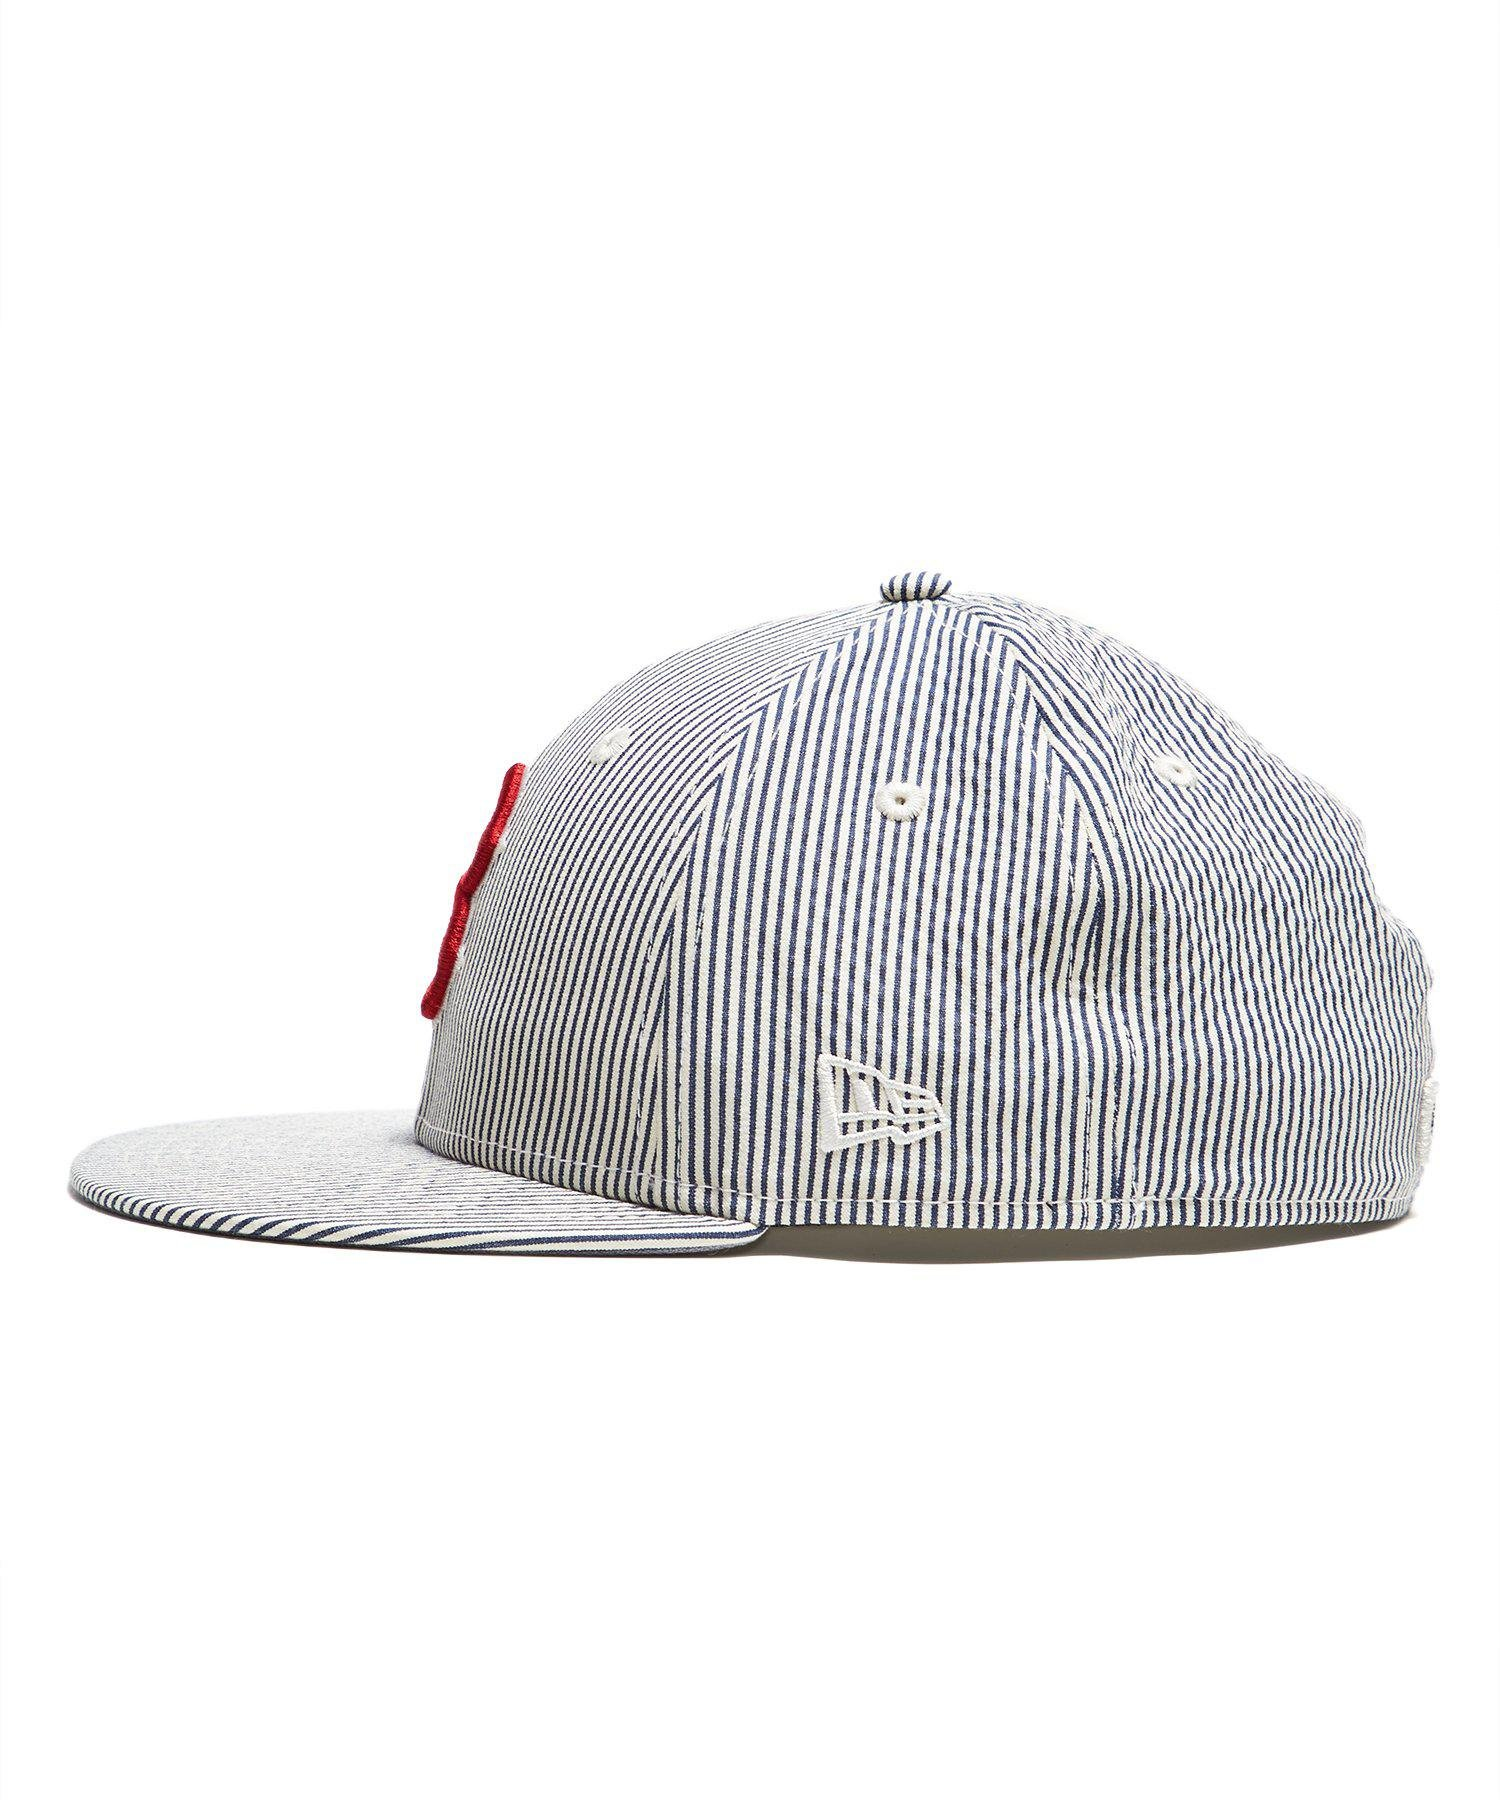 af9594d488b New Era Hats Boston Red Sox Cap In Seersucker in Blue for Men - Lyst